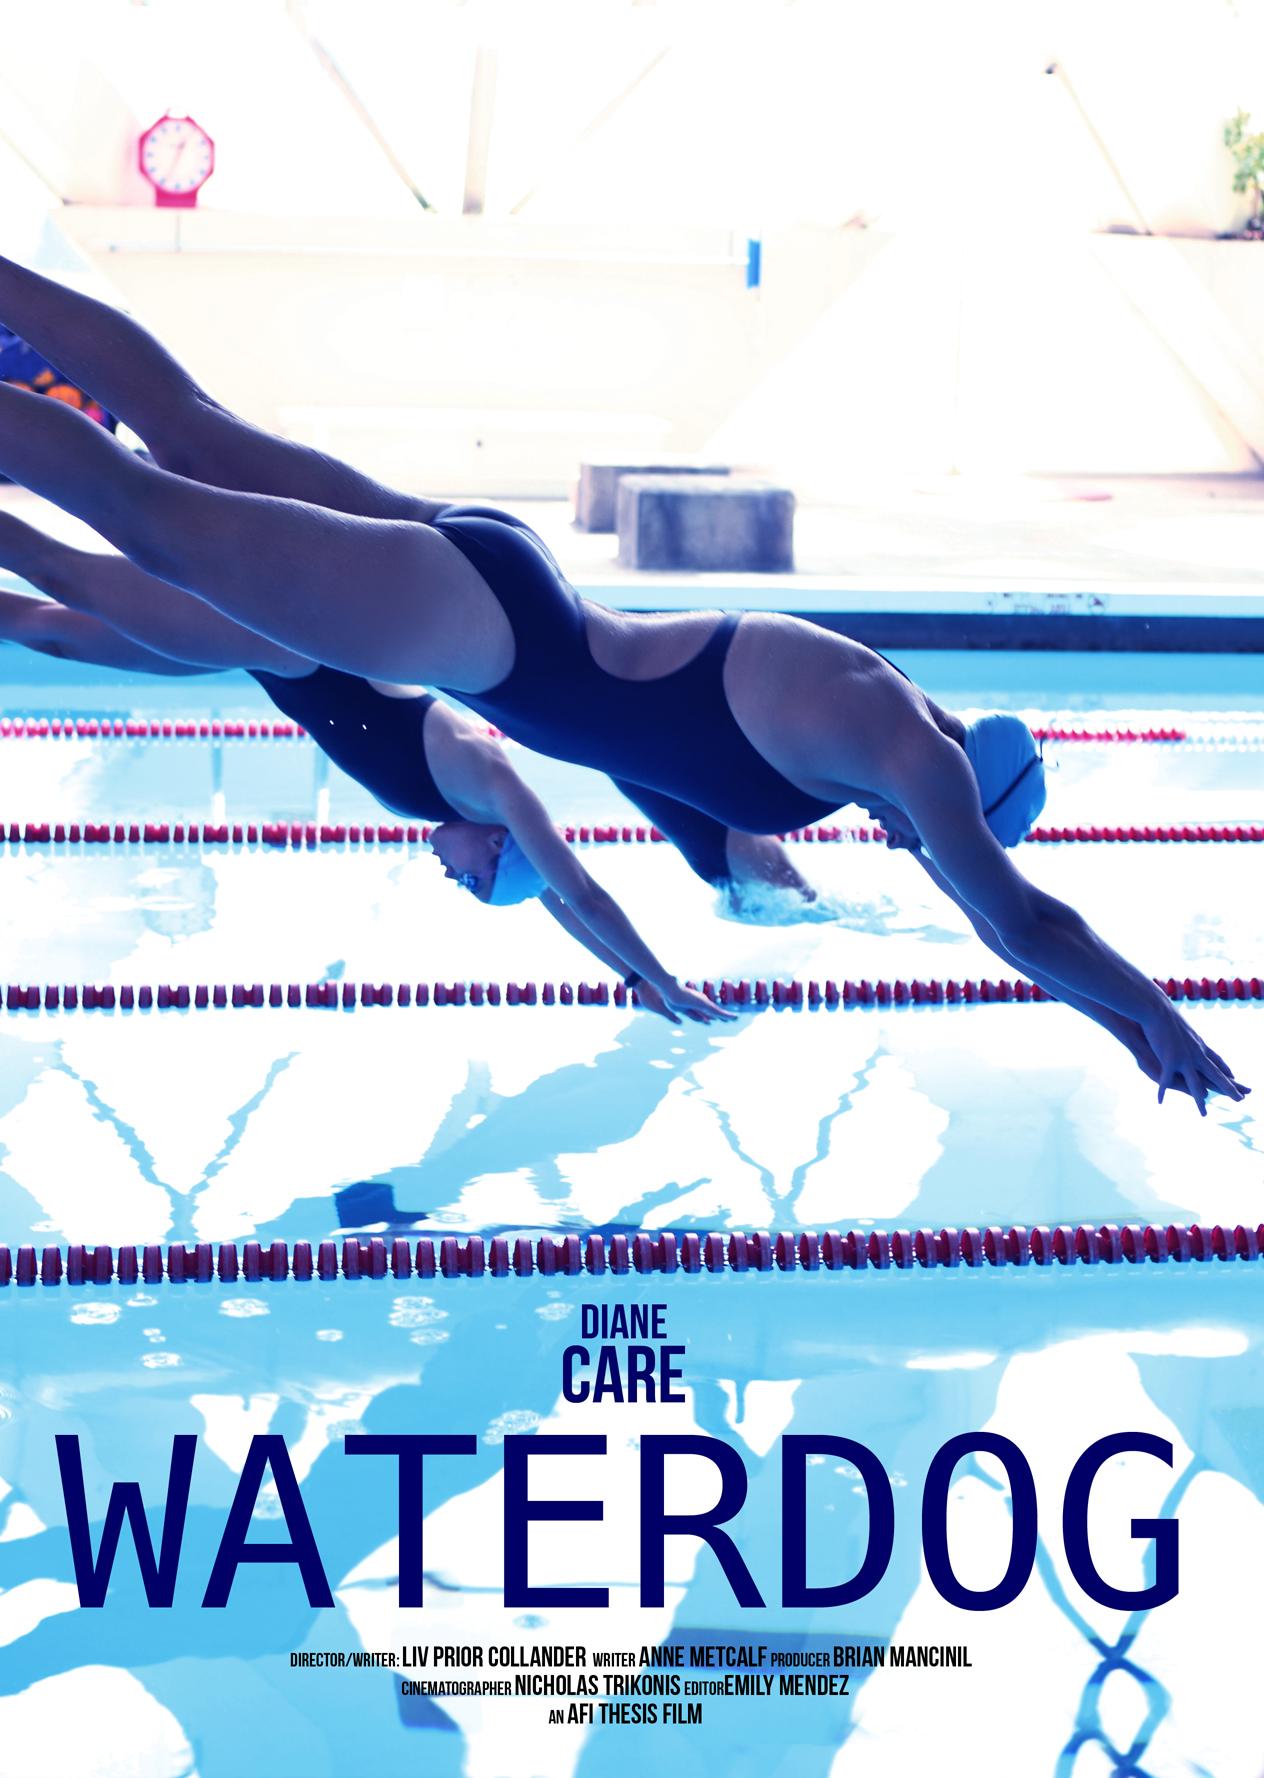 Waterdog poster 1.jpg